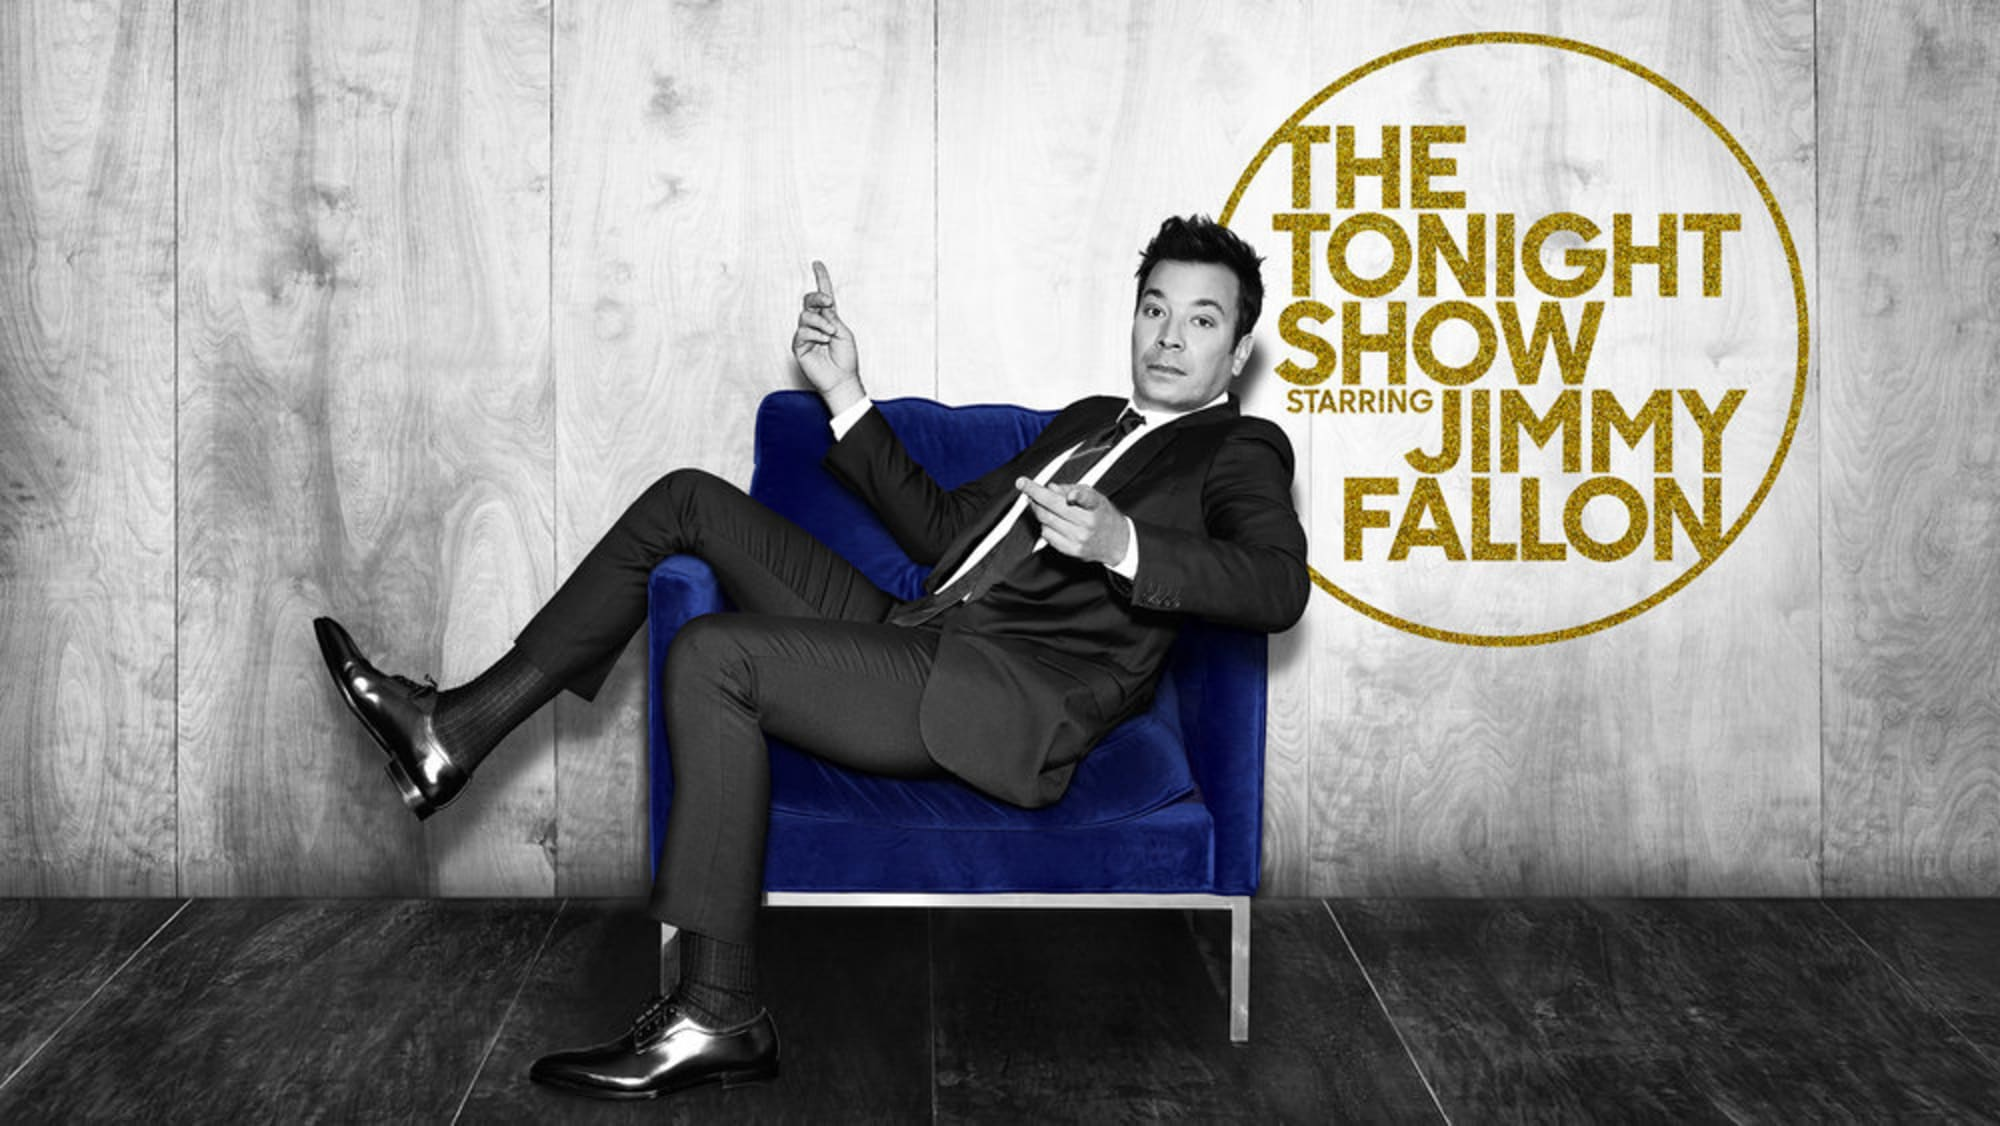 Is The Tonight Show Starring Jimmy Fallon new tonight, January 25?